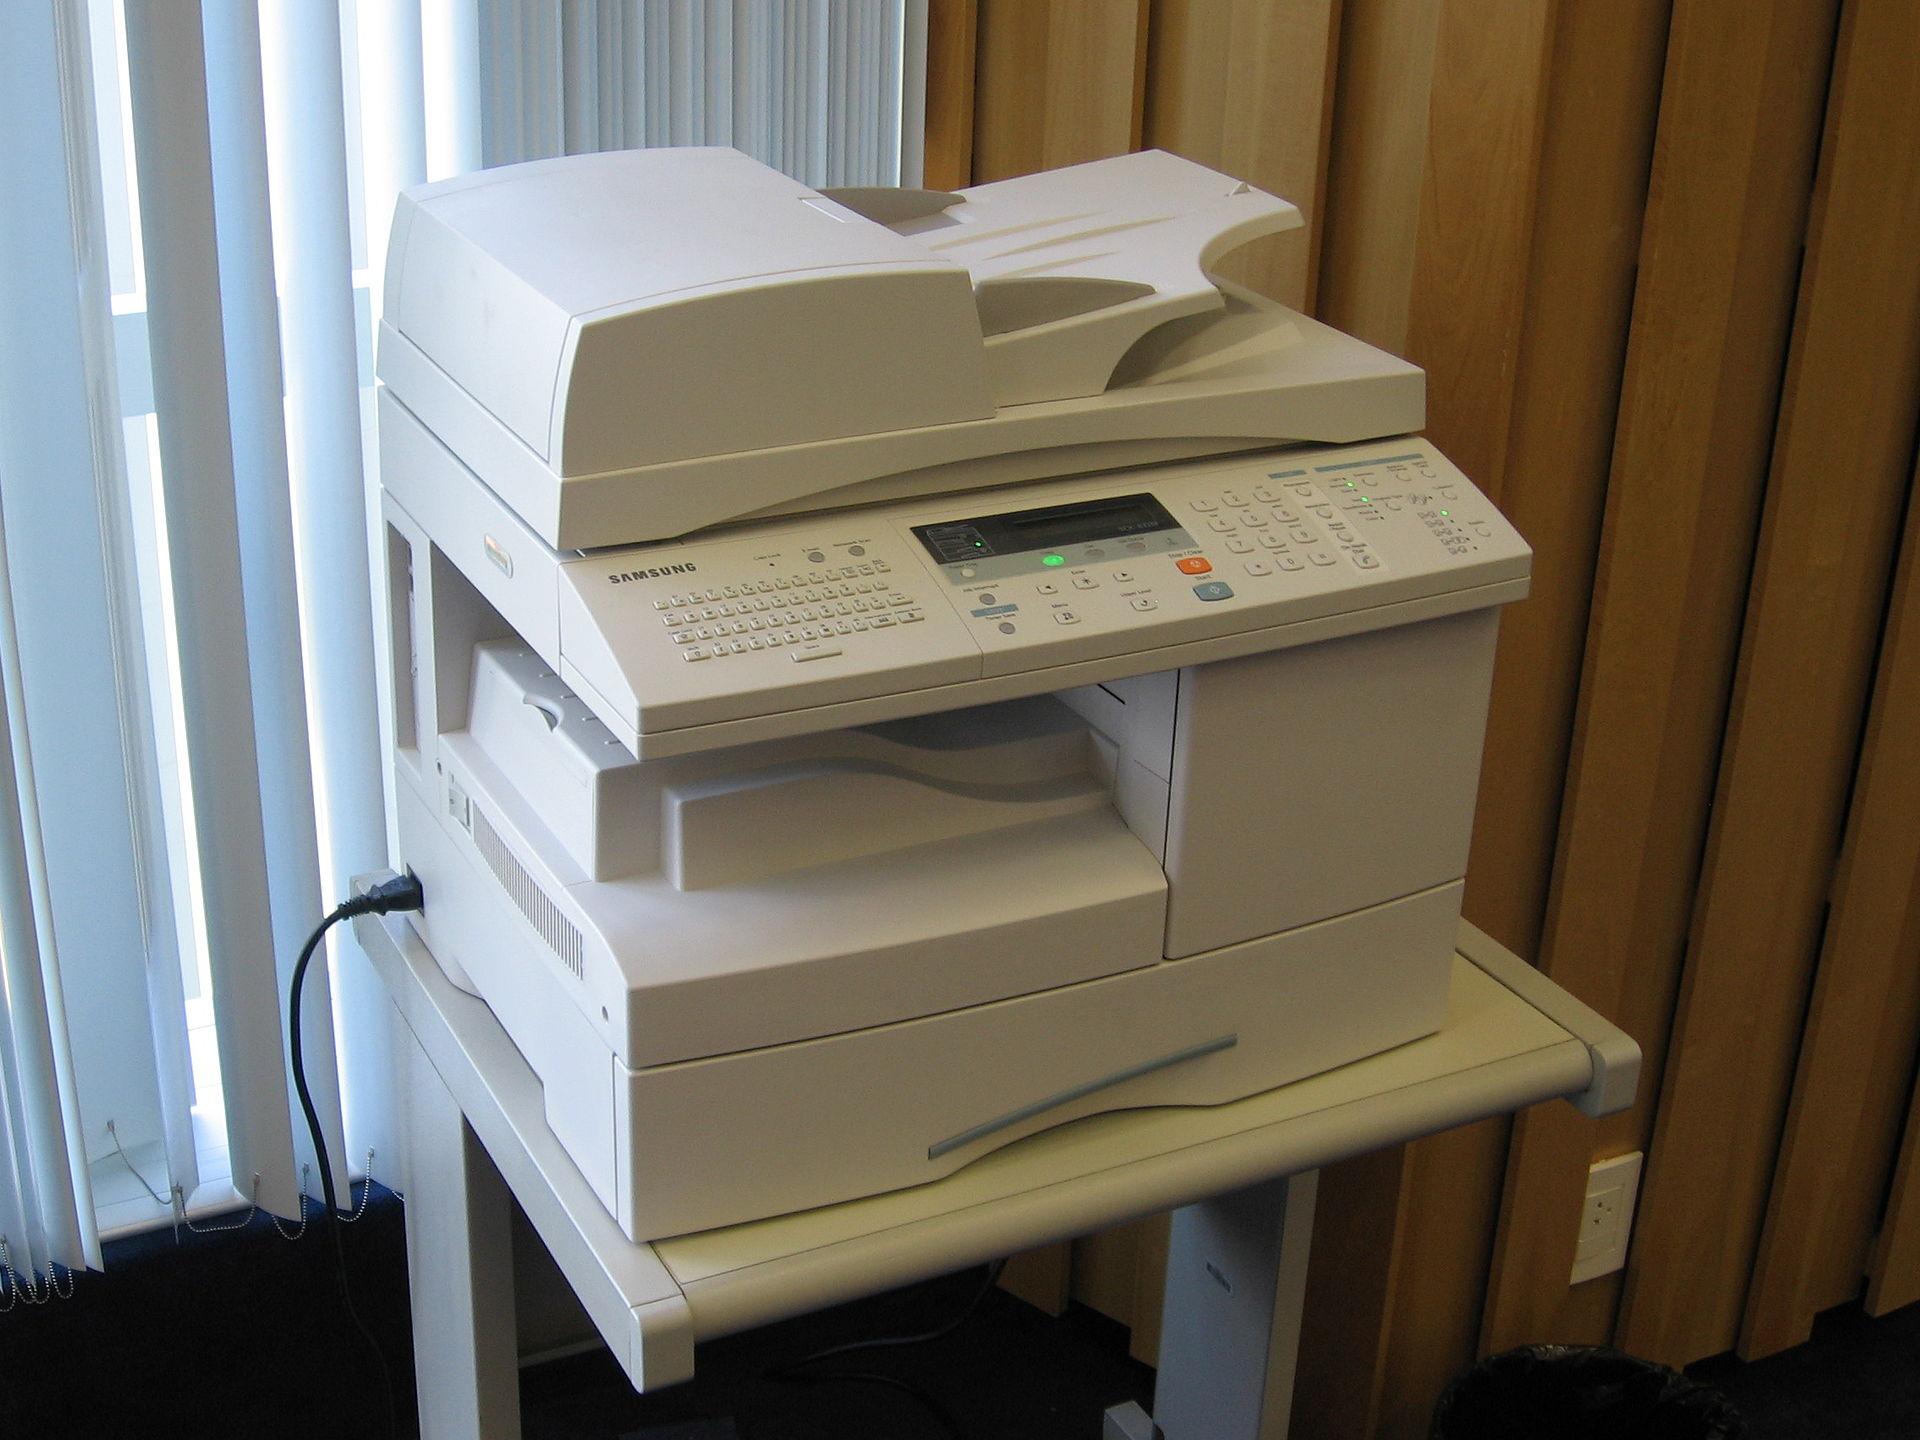 Multifunction printer  Wikipedia